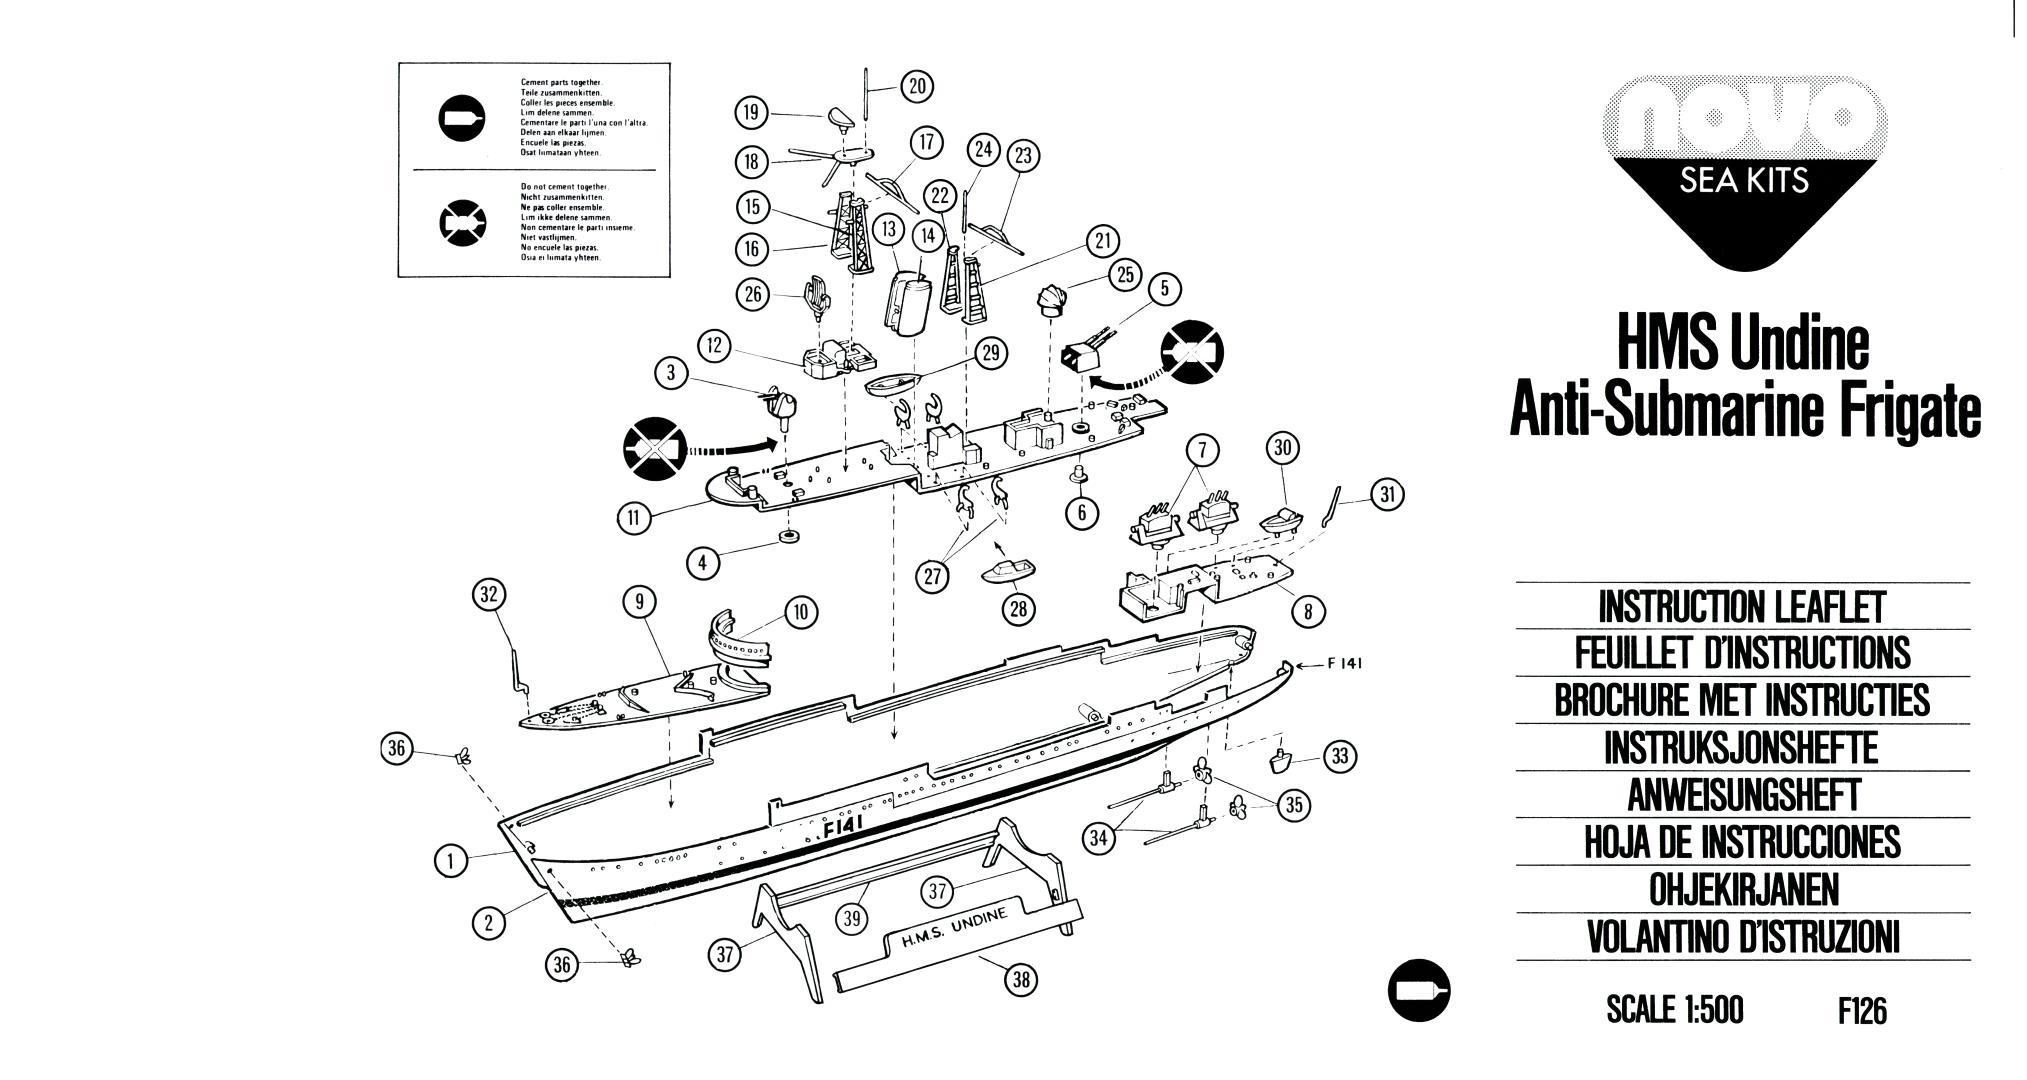 Инструкция NOVO Toys Ltd F126 Cat.No.76029 HMS Undine Anti-Submarine Frigate